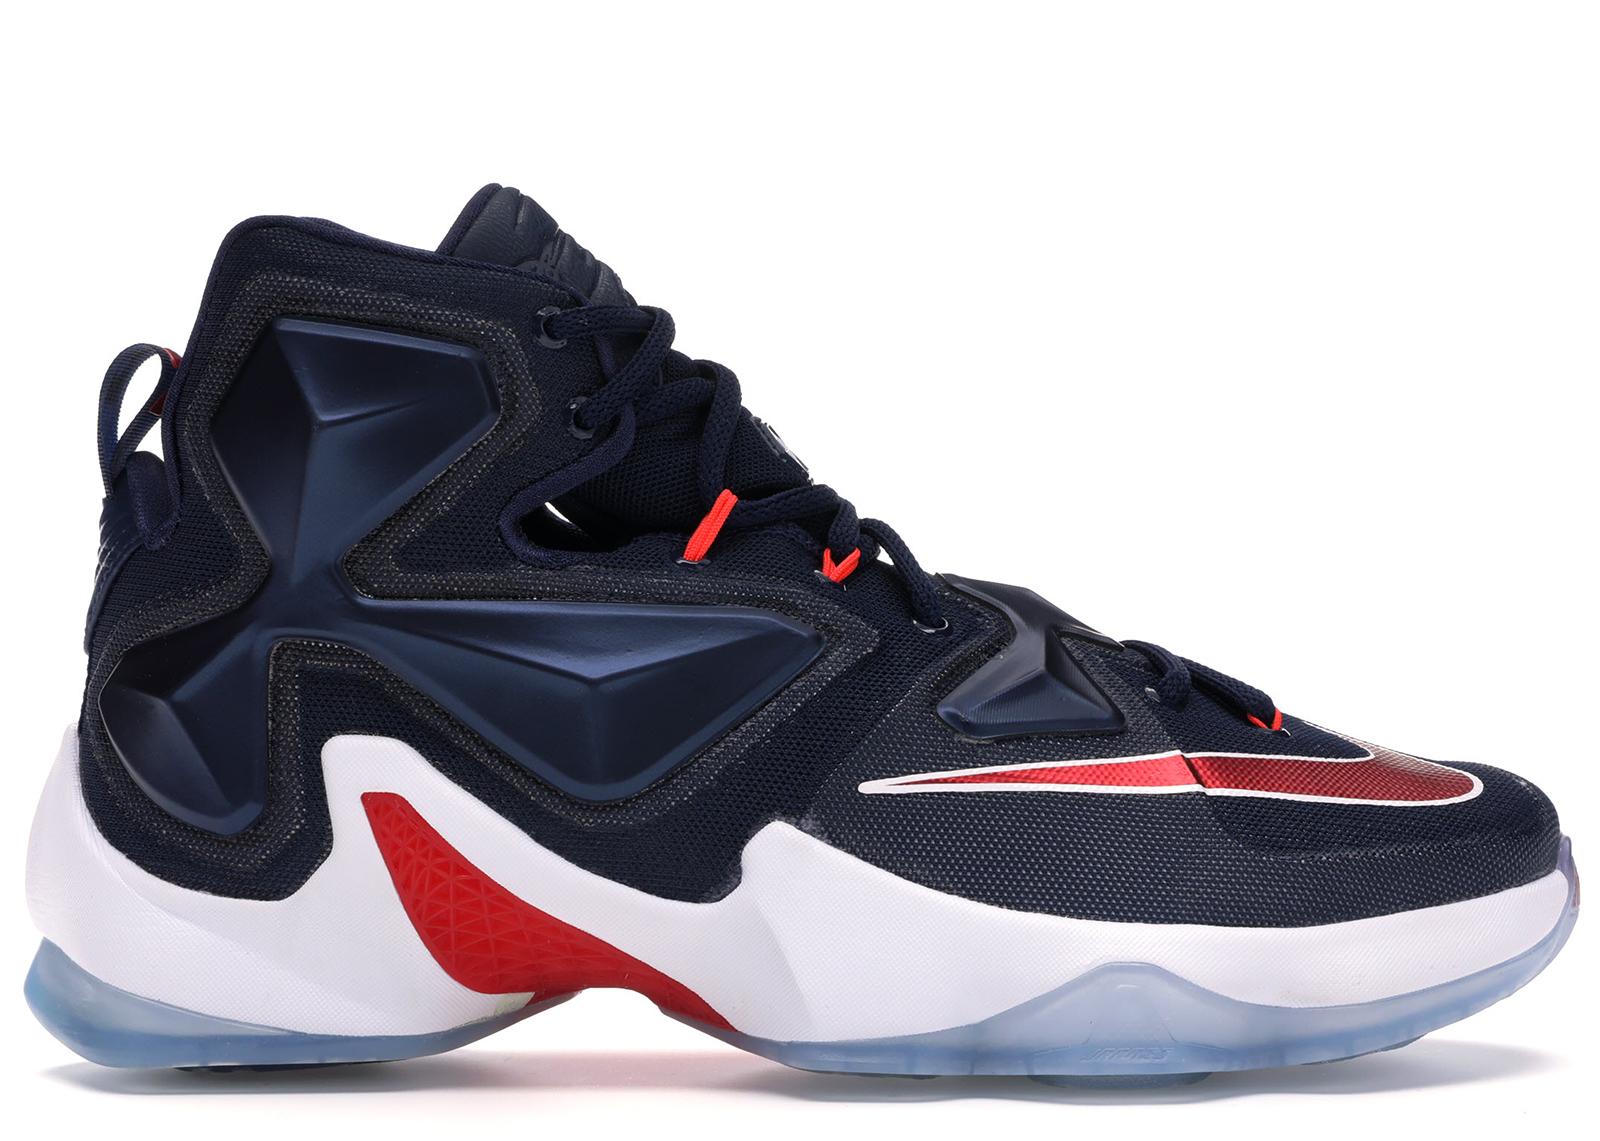 Nike LeBron 13 Midnight Navy - 807219-461